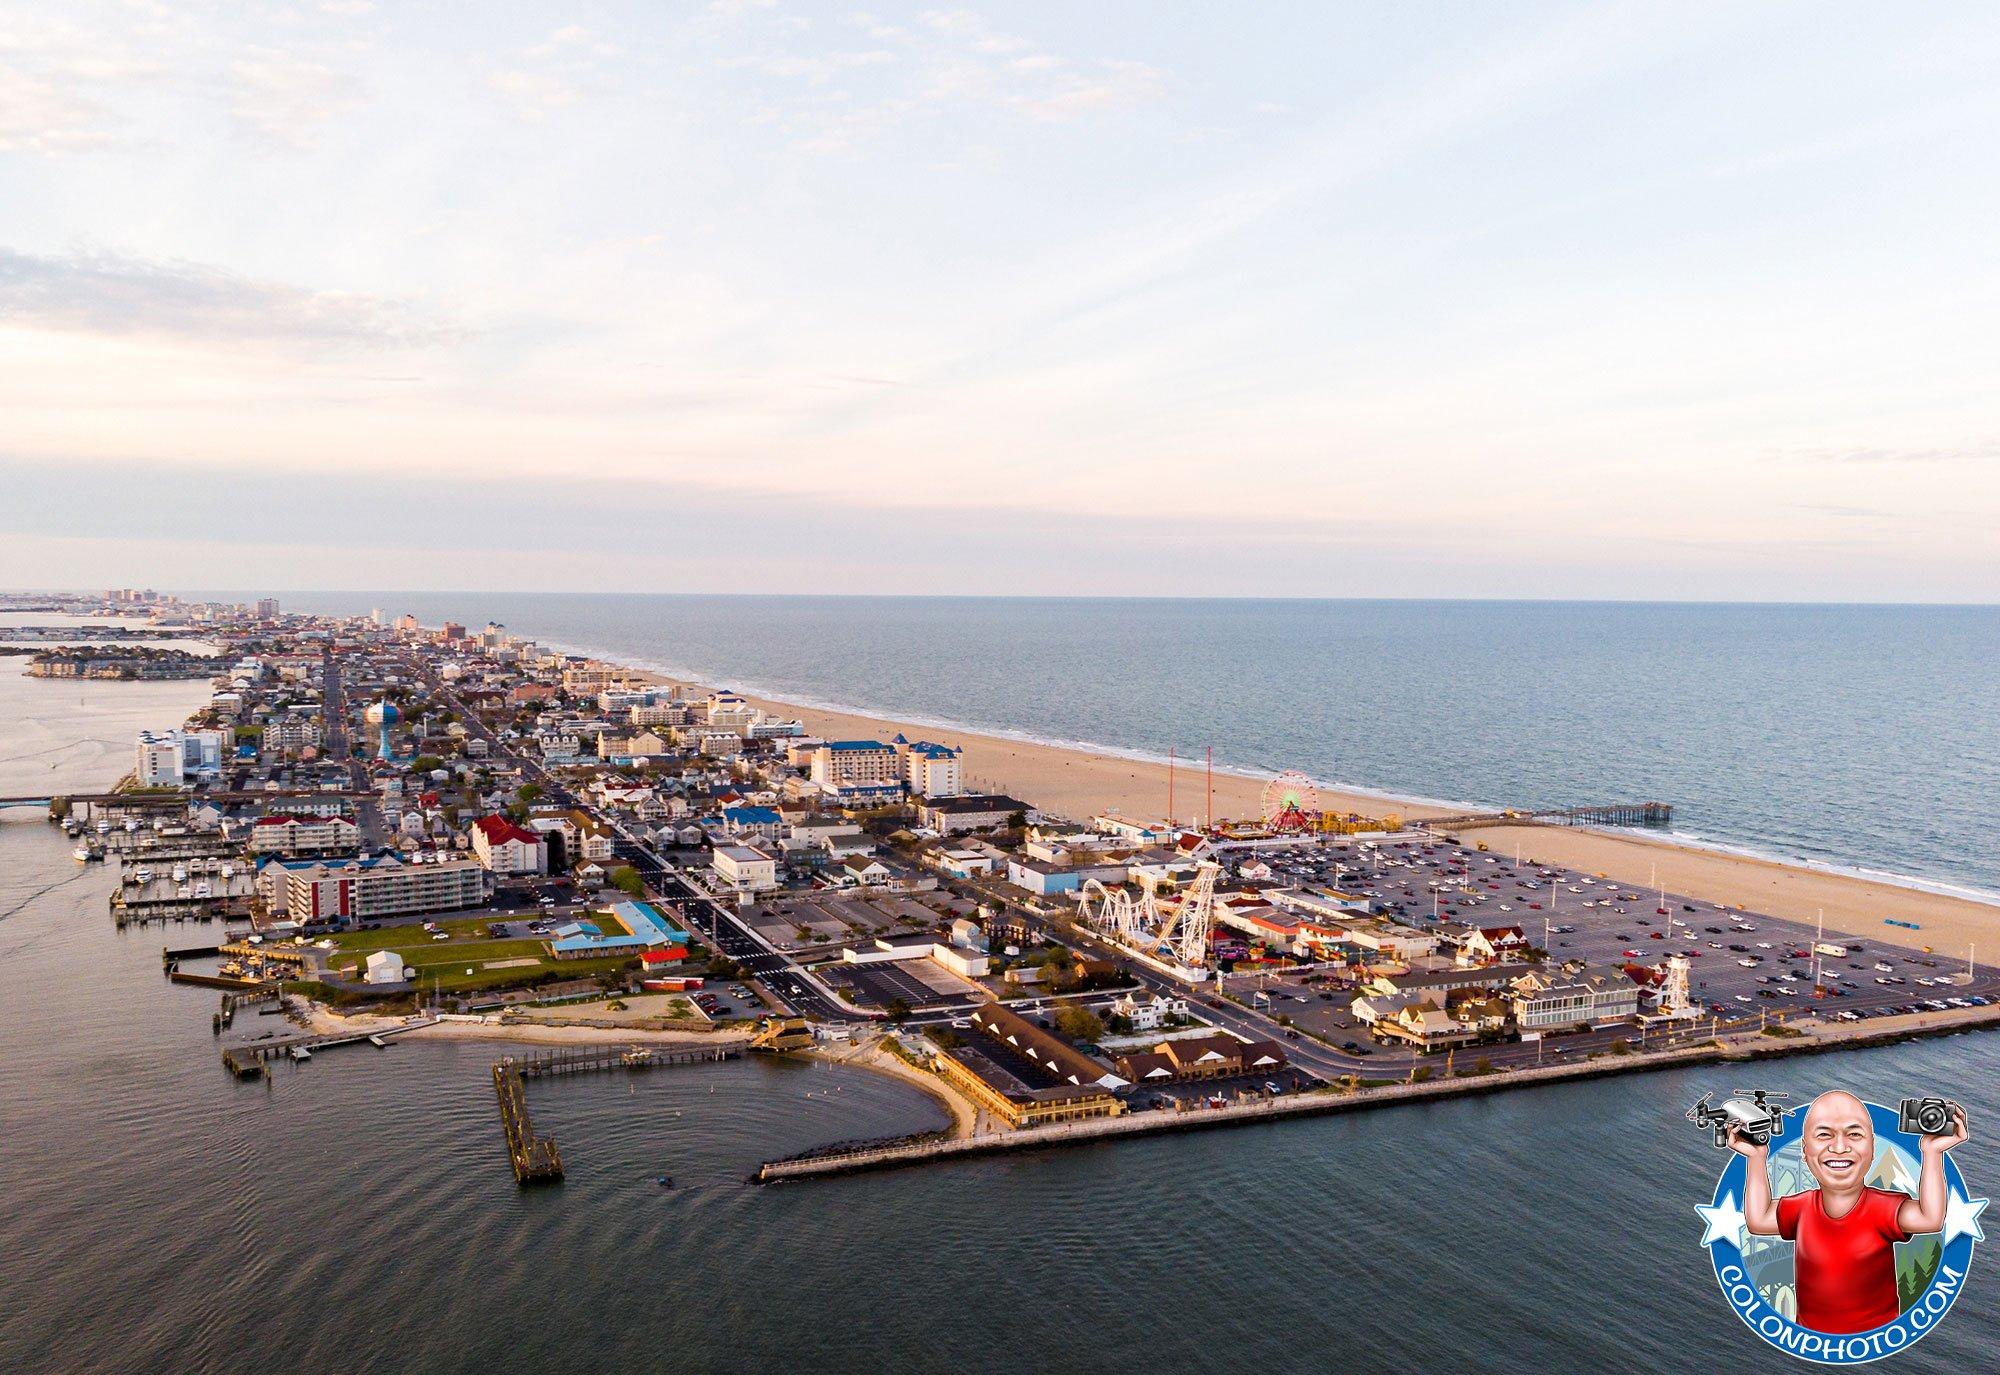 OCEAN-CITY-MARYLAND---DRONE-PHOTO---colonphoto.com